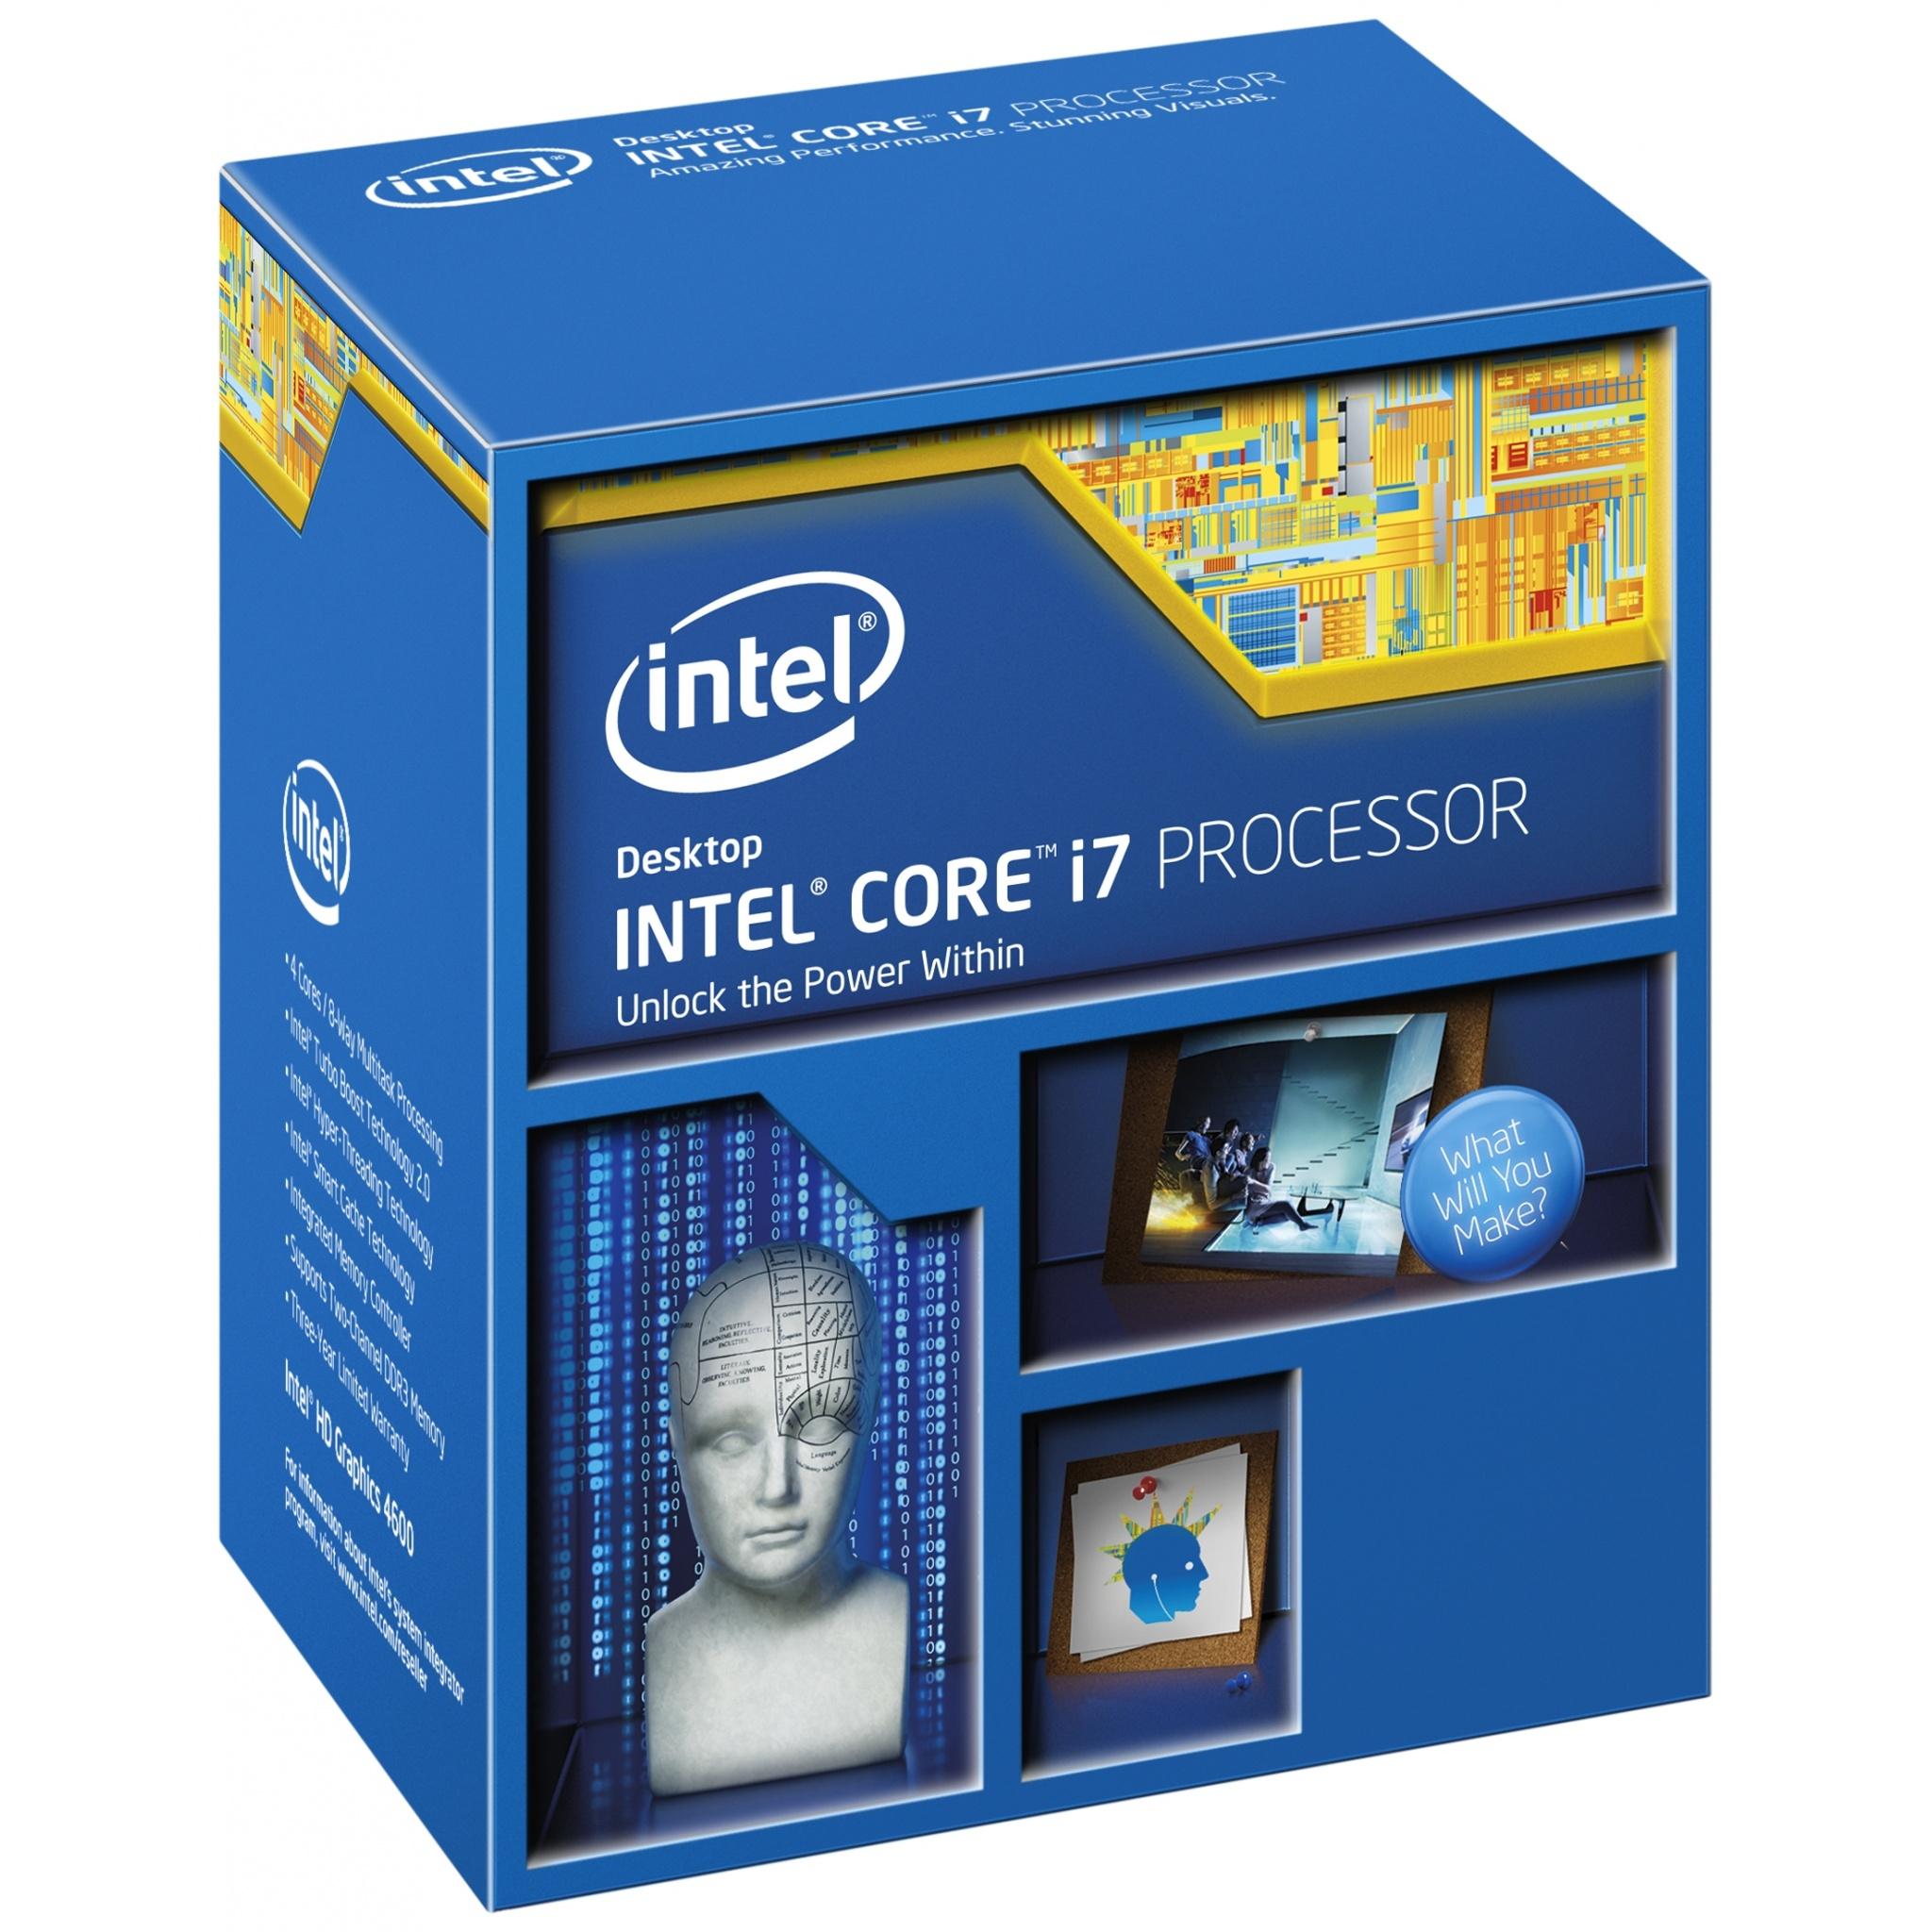 Intel Core i7 - 5775C 3.3GHz Broadwell CPU LGA1150 Desktop-Prozessor Boxed